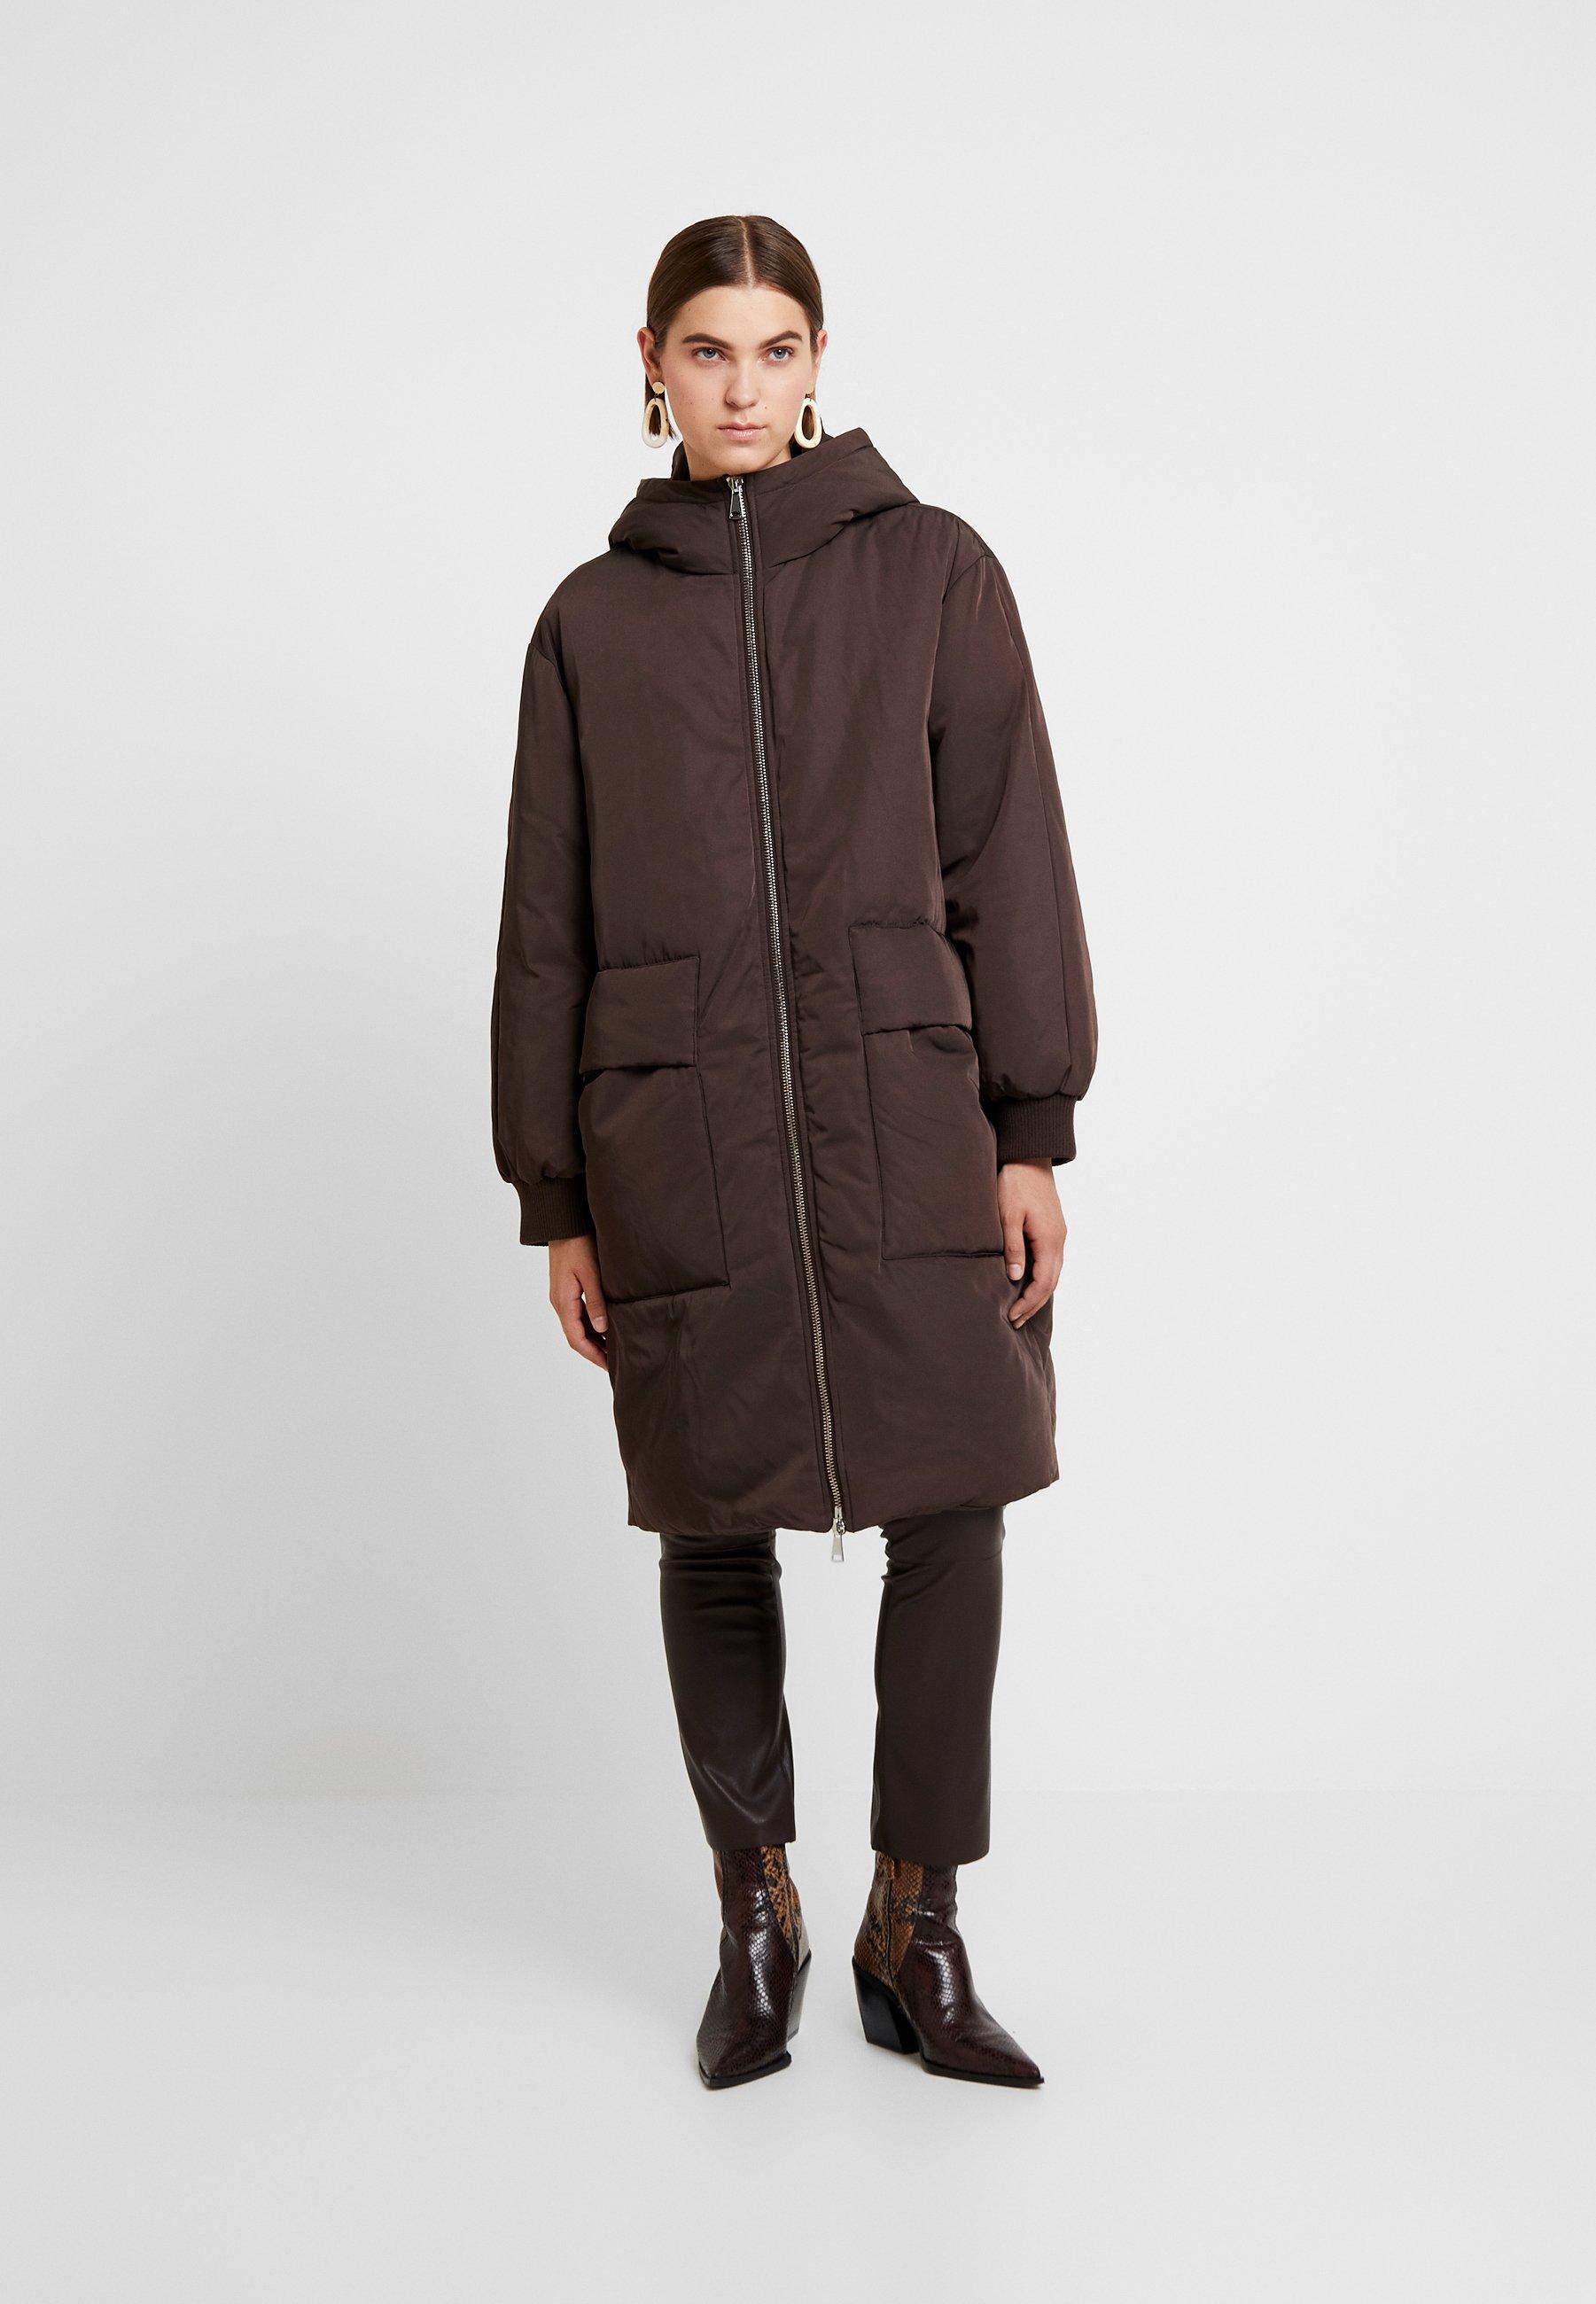 Carin Wester Coat Odette - Winterjas Brown B8seo1T0